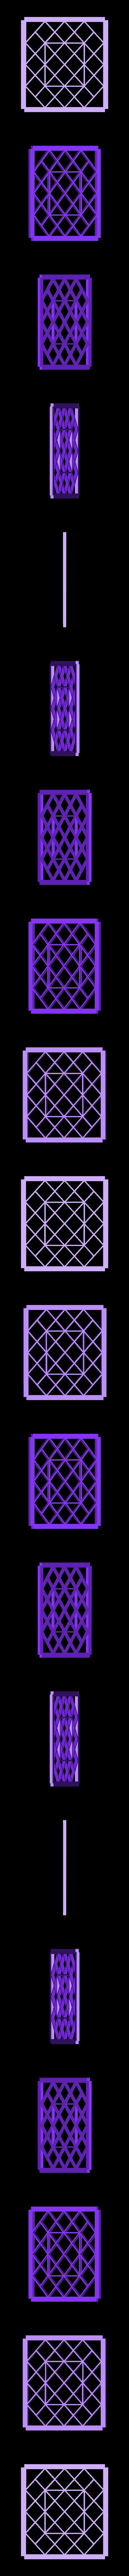 Panel.stl Download STL file Desk Lamp • 3D printing object, xracksox